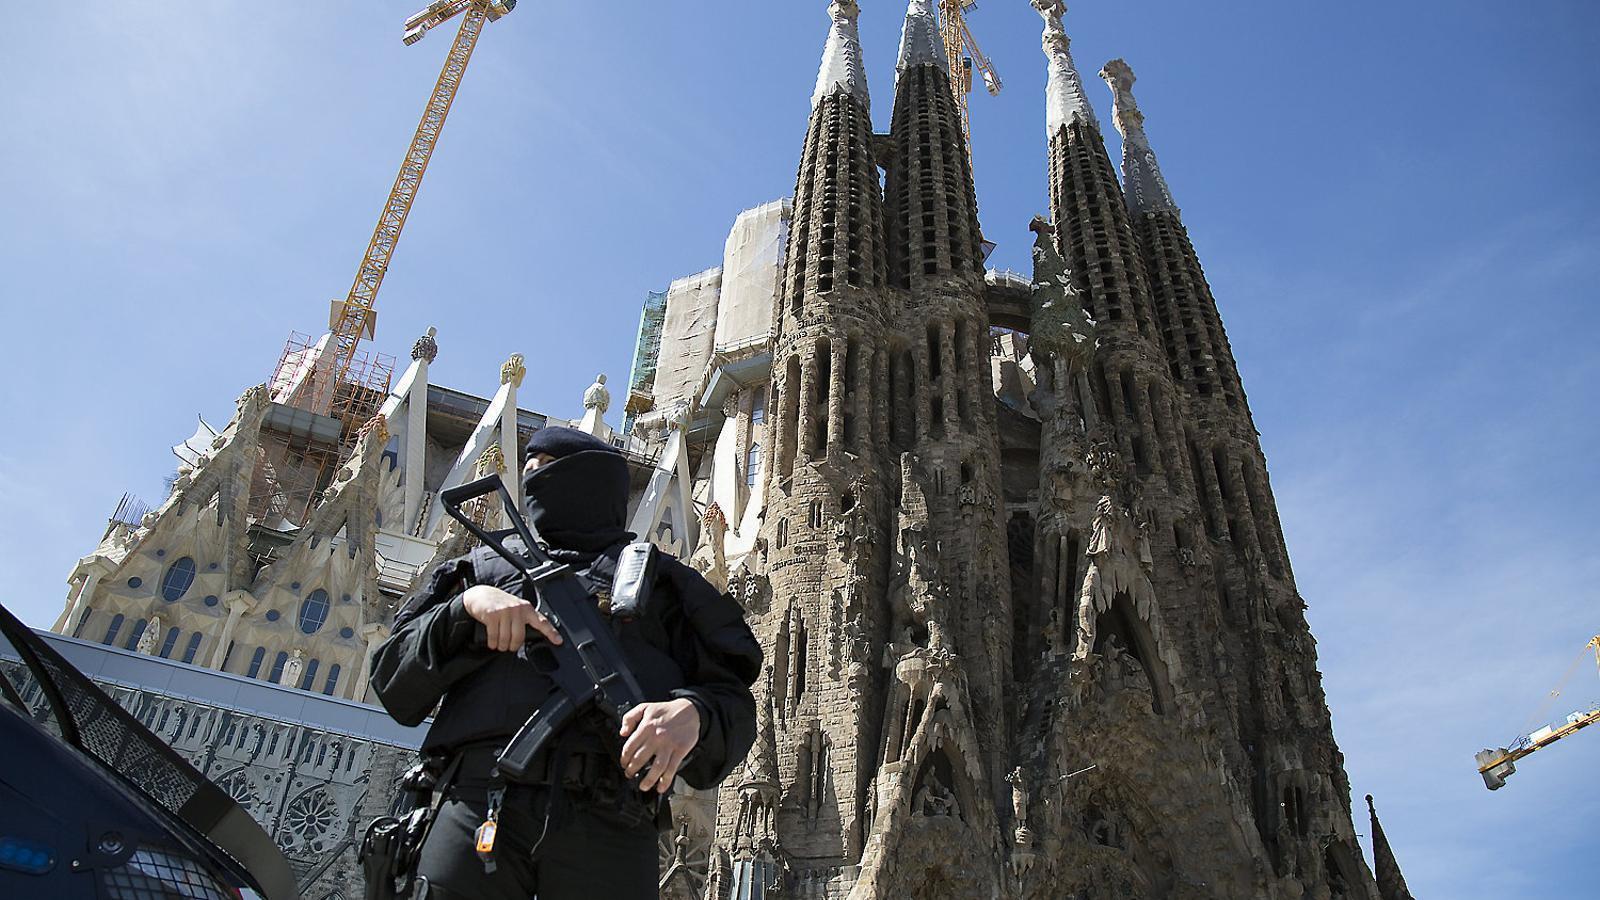 Un mosso en un operatiu de patrullatge preventiu antiterrorista a Barcelona.